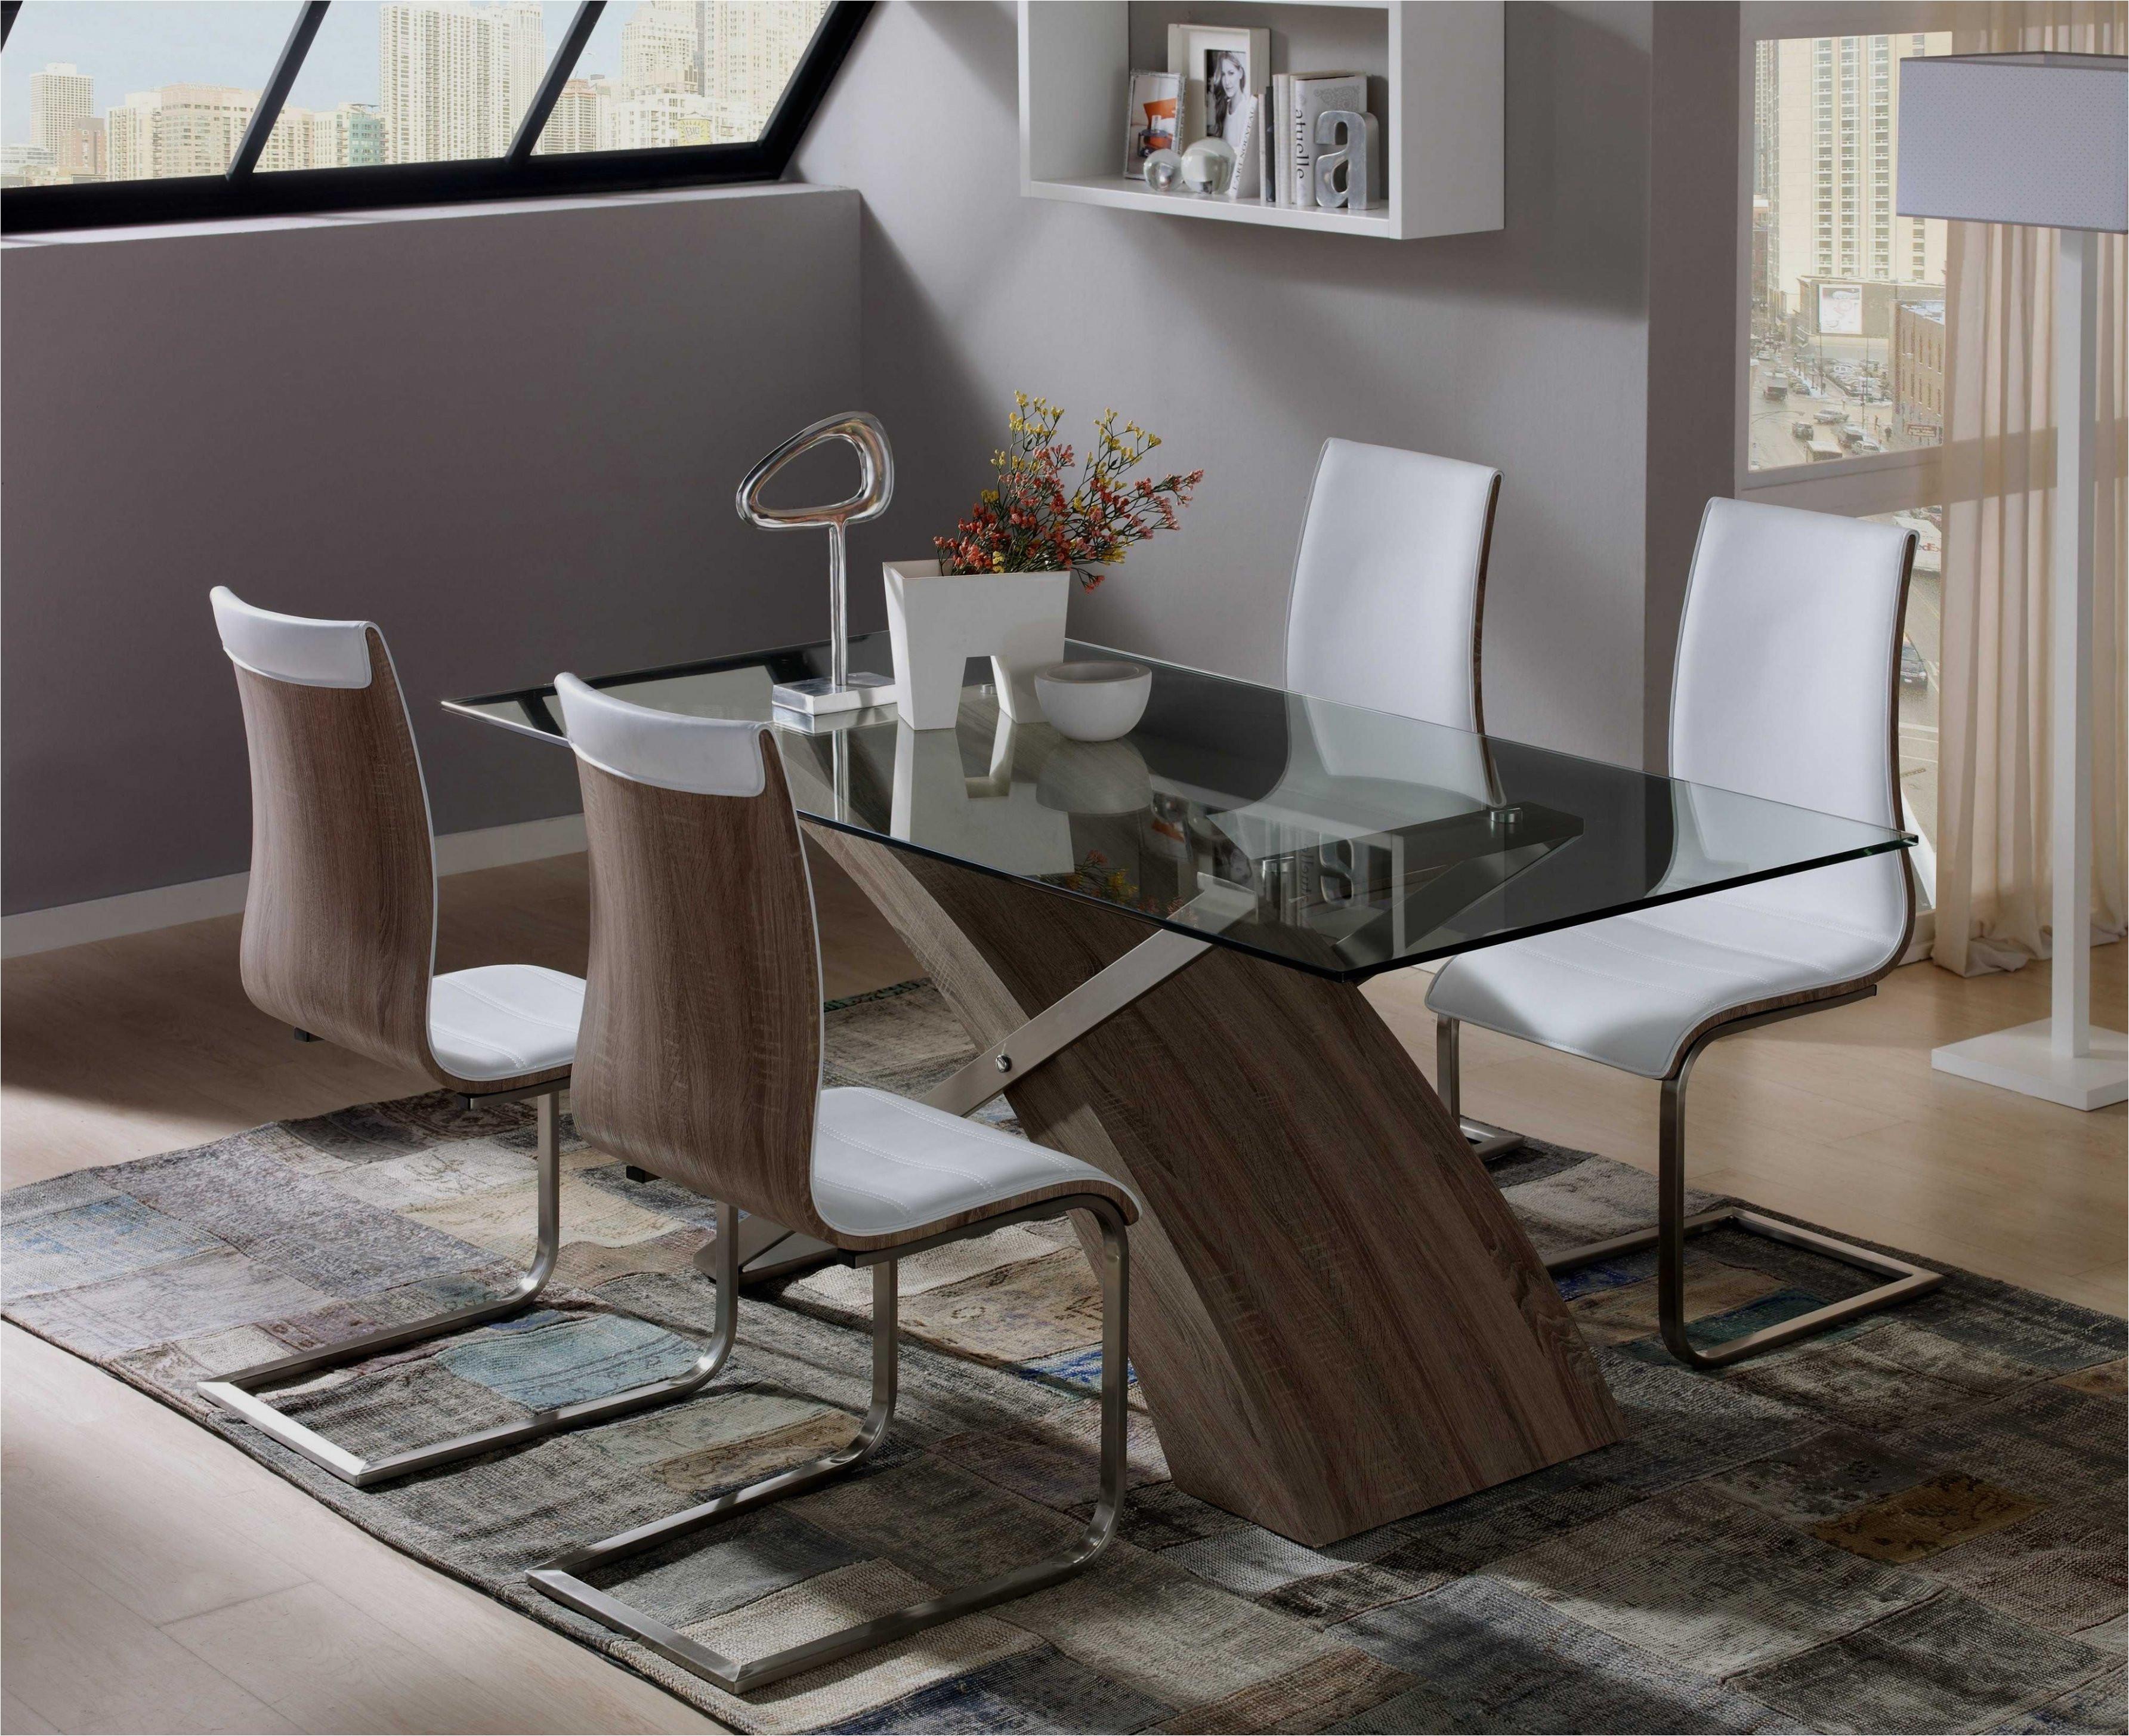 mesas de centro bien adornos para centro de mesa media cache ec0 pinimg originals aa 0d